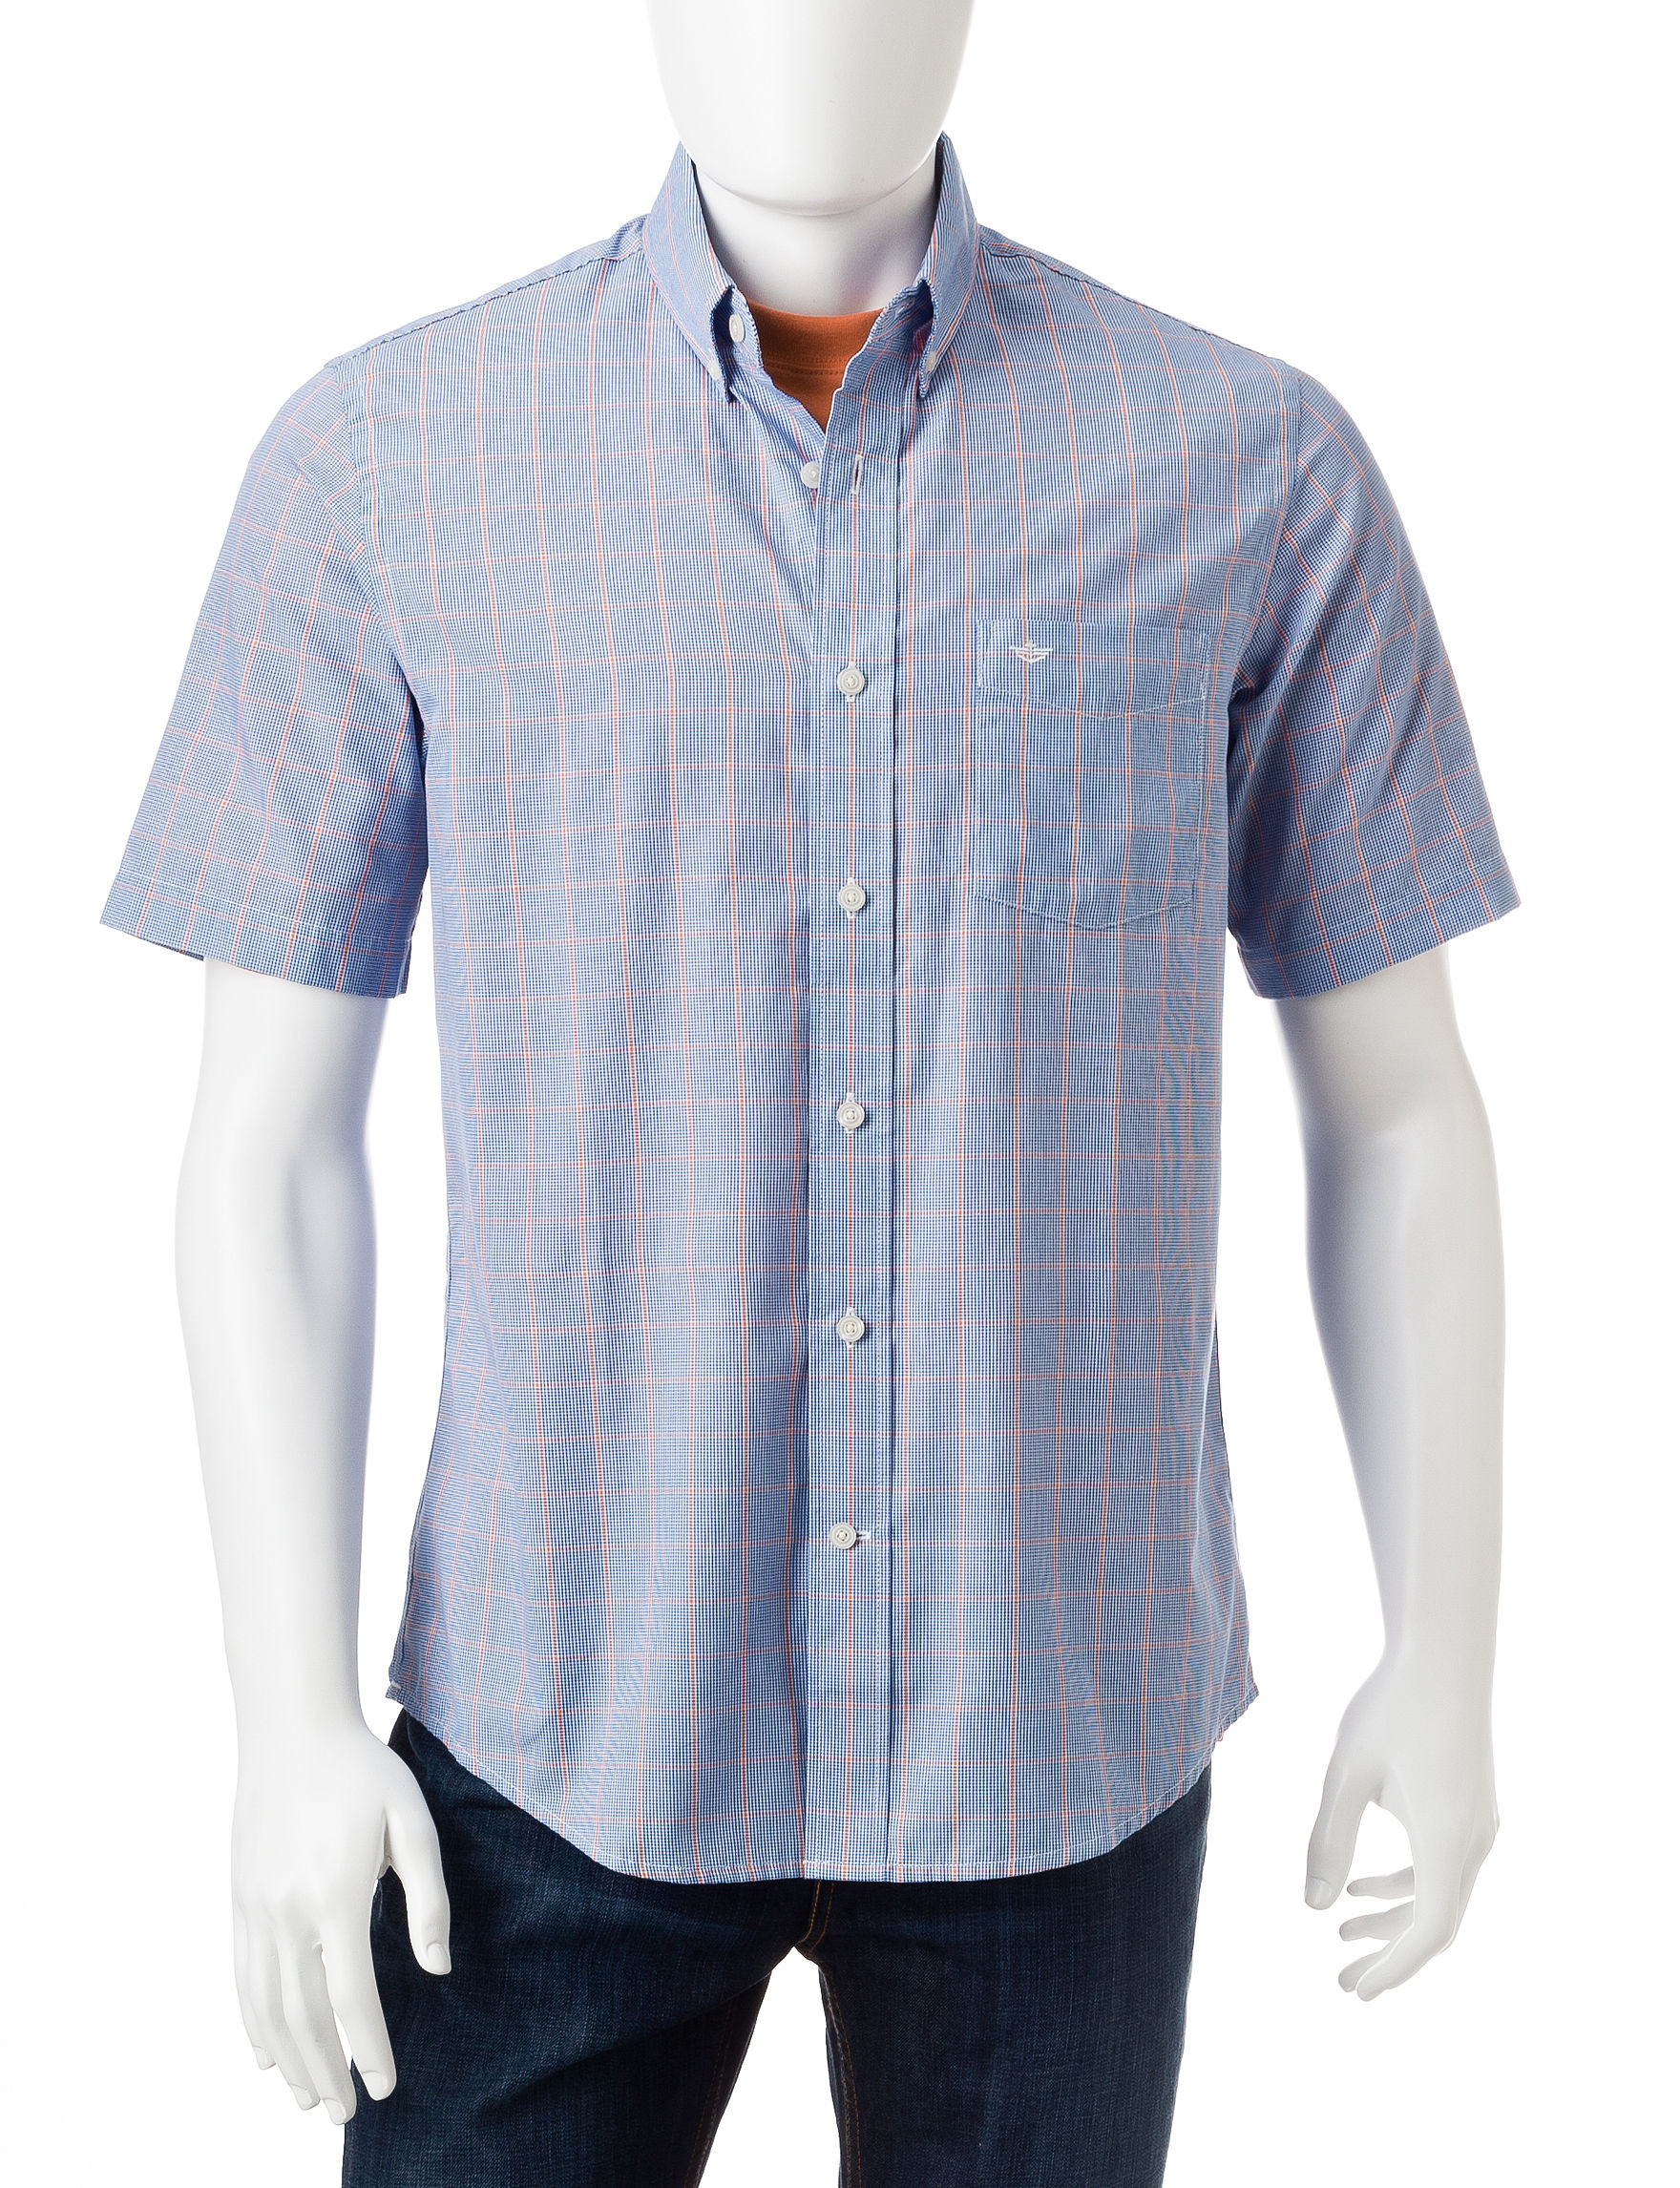 Dockers Blue Casual Button Down Shirts